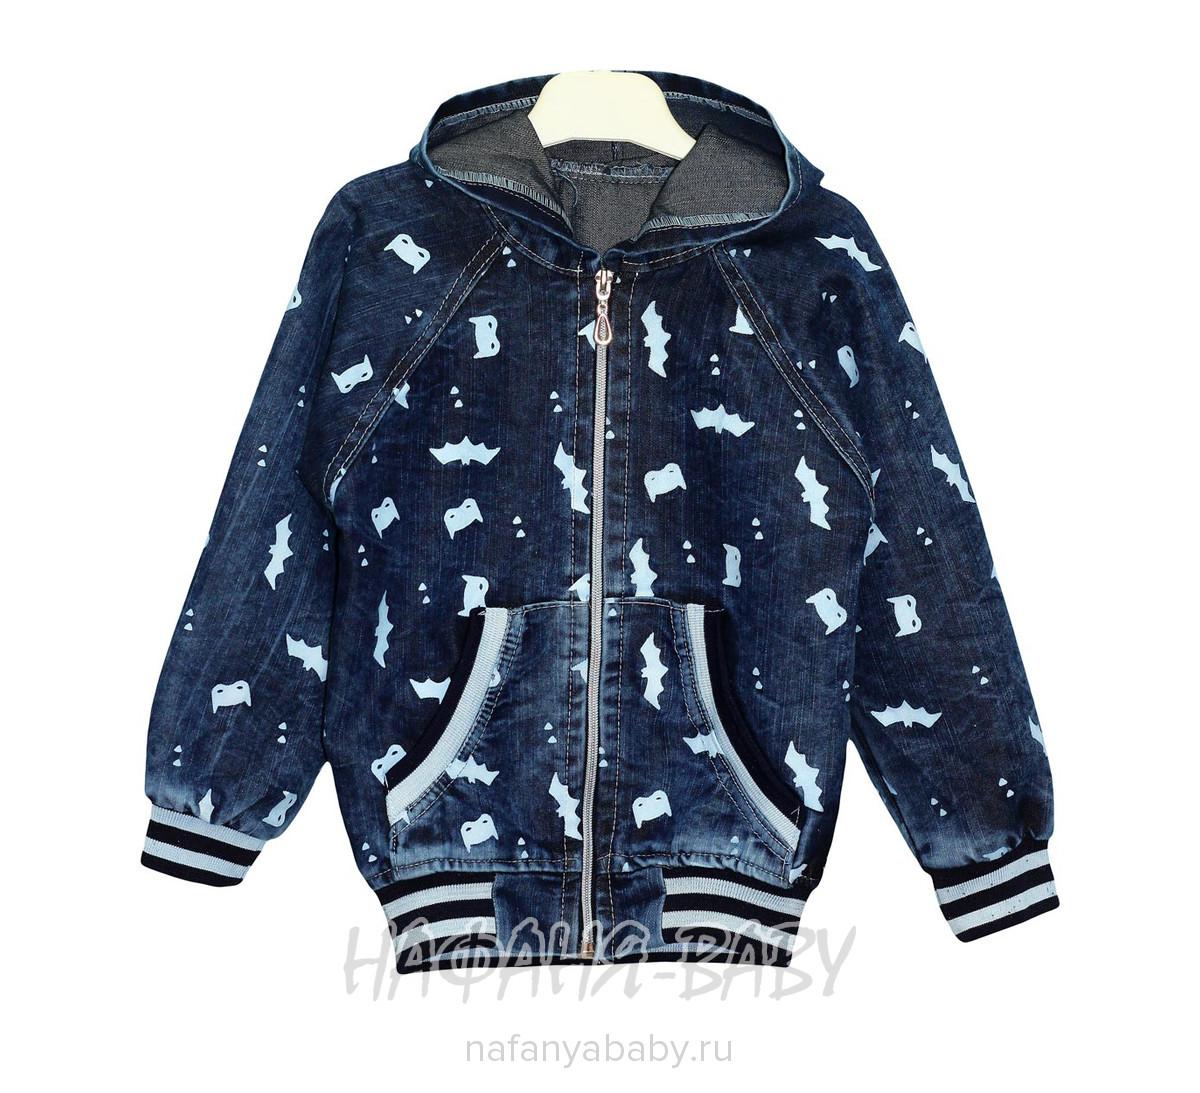 Детская куртка, артикул 1810 AKIRA арт: 1810, цвет темно-синий, оптом Турция